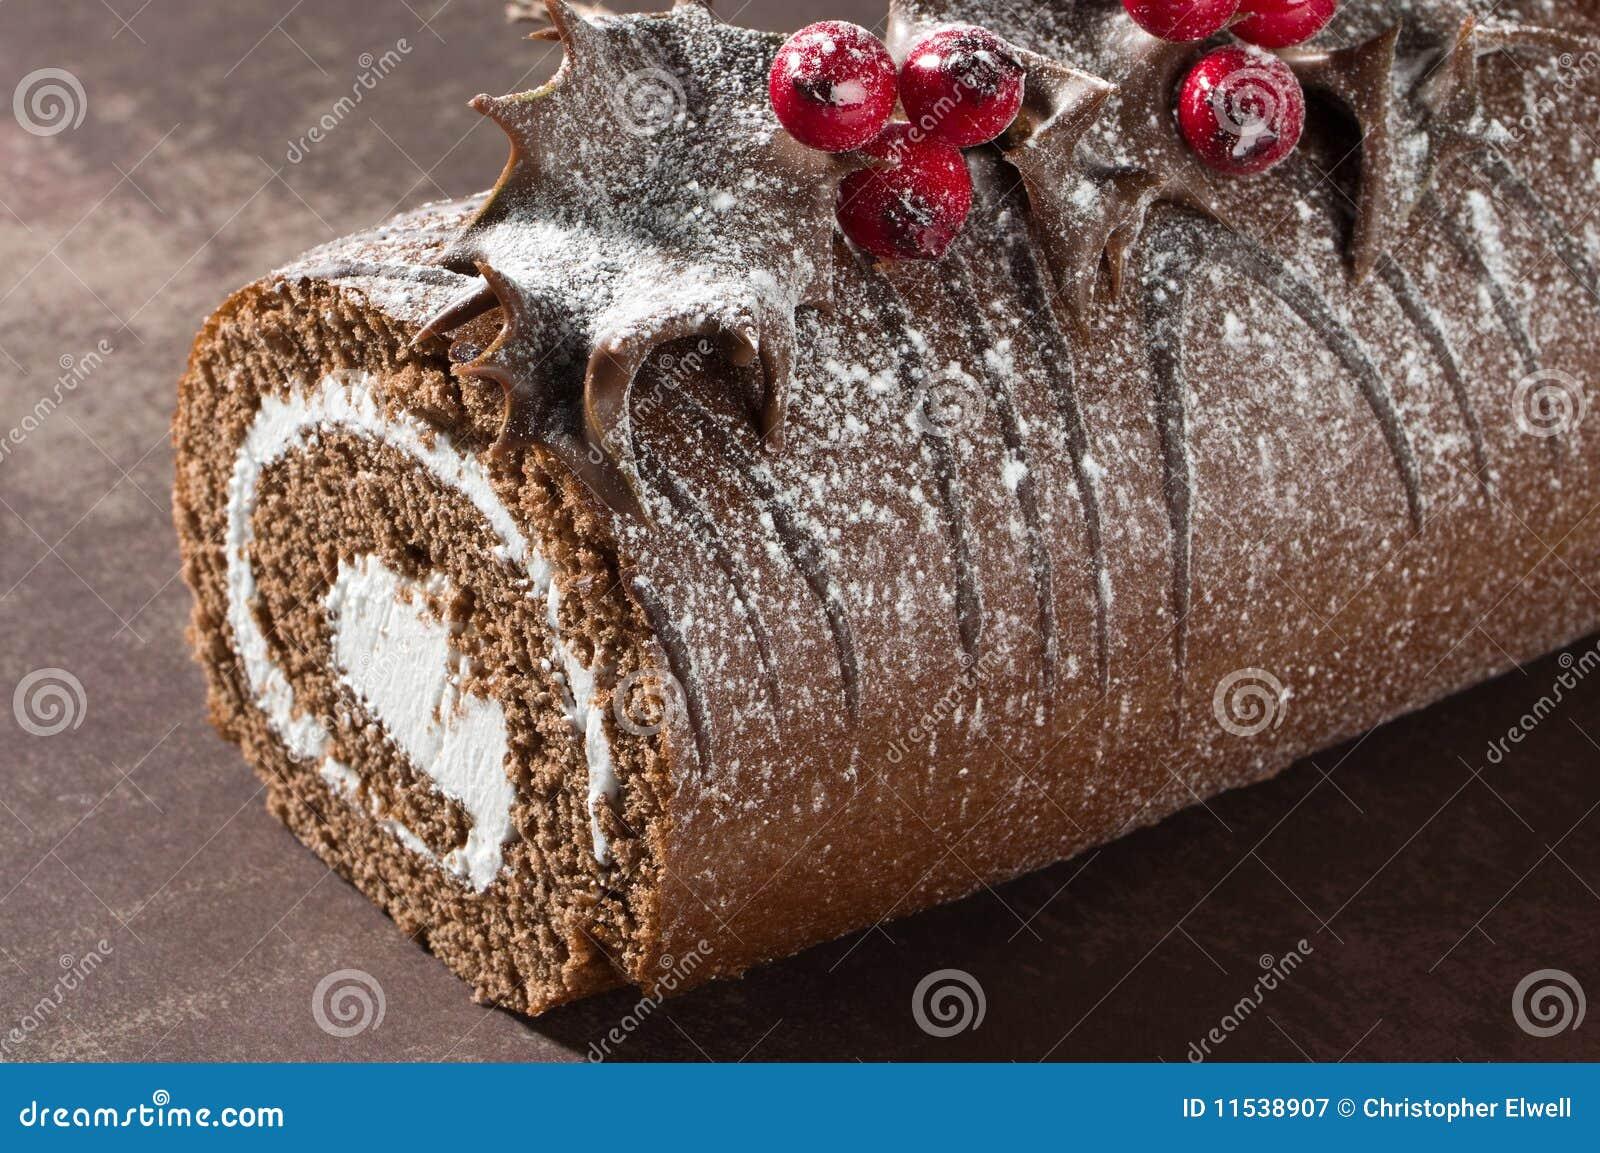 Christmas Yule Log Close Up Royalty Free Stock Photography